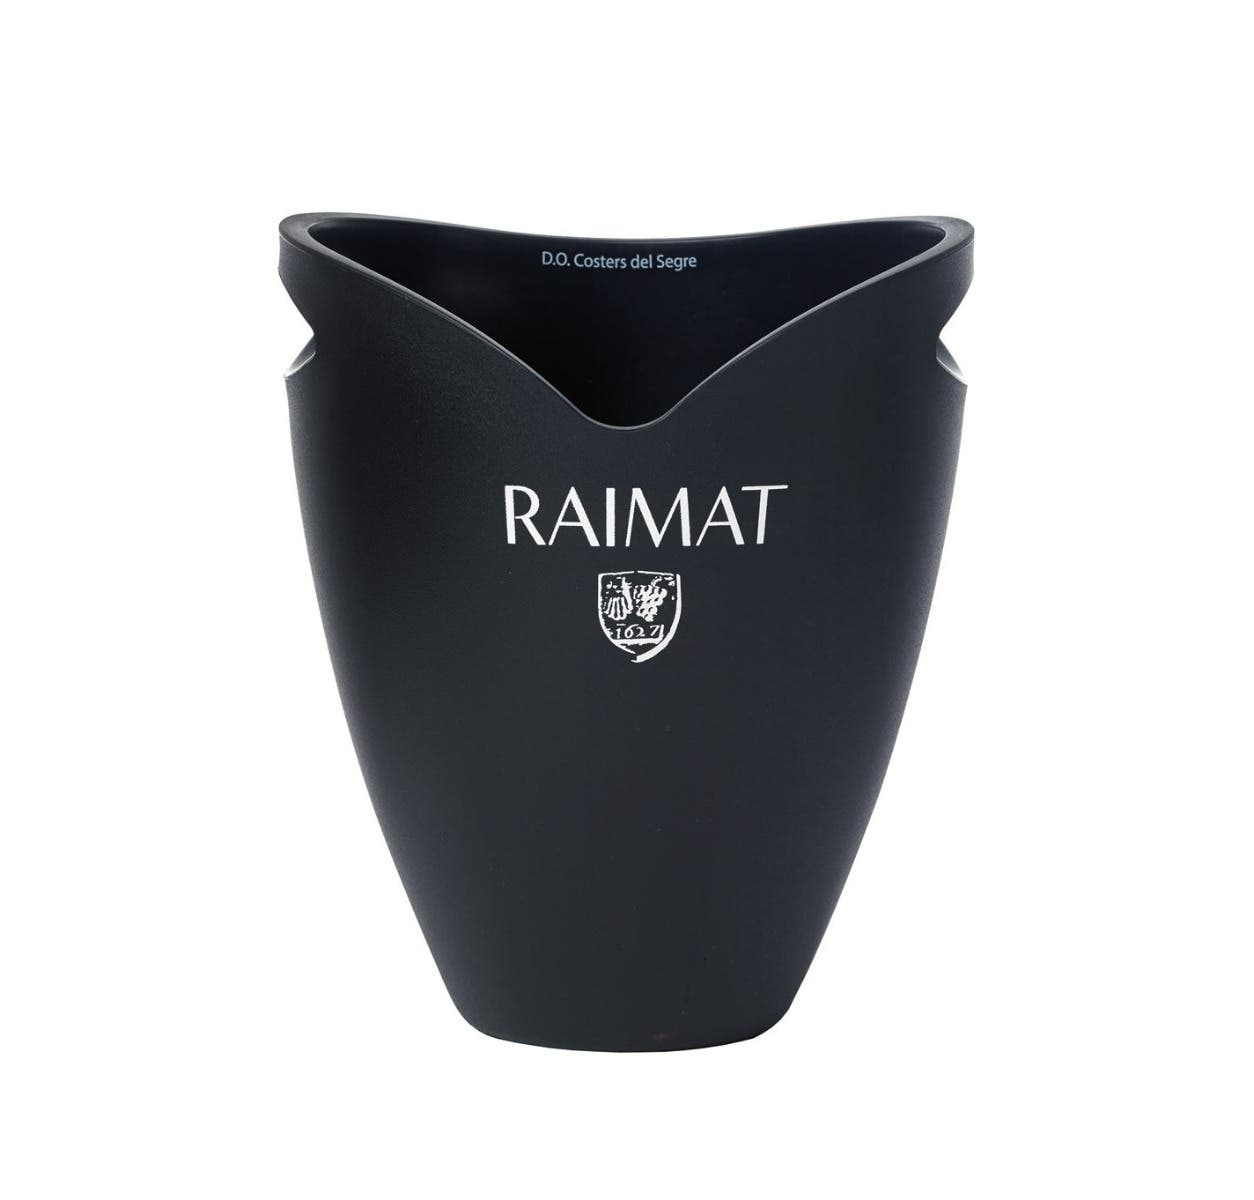 Raimat Black Bucket (1 bot.)